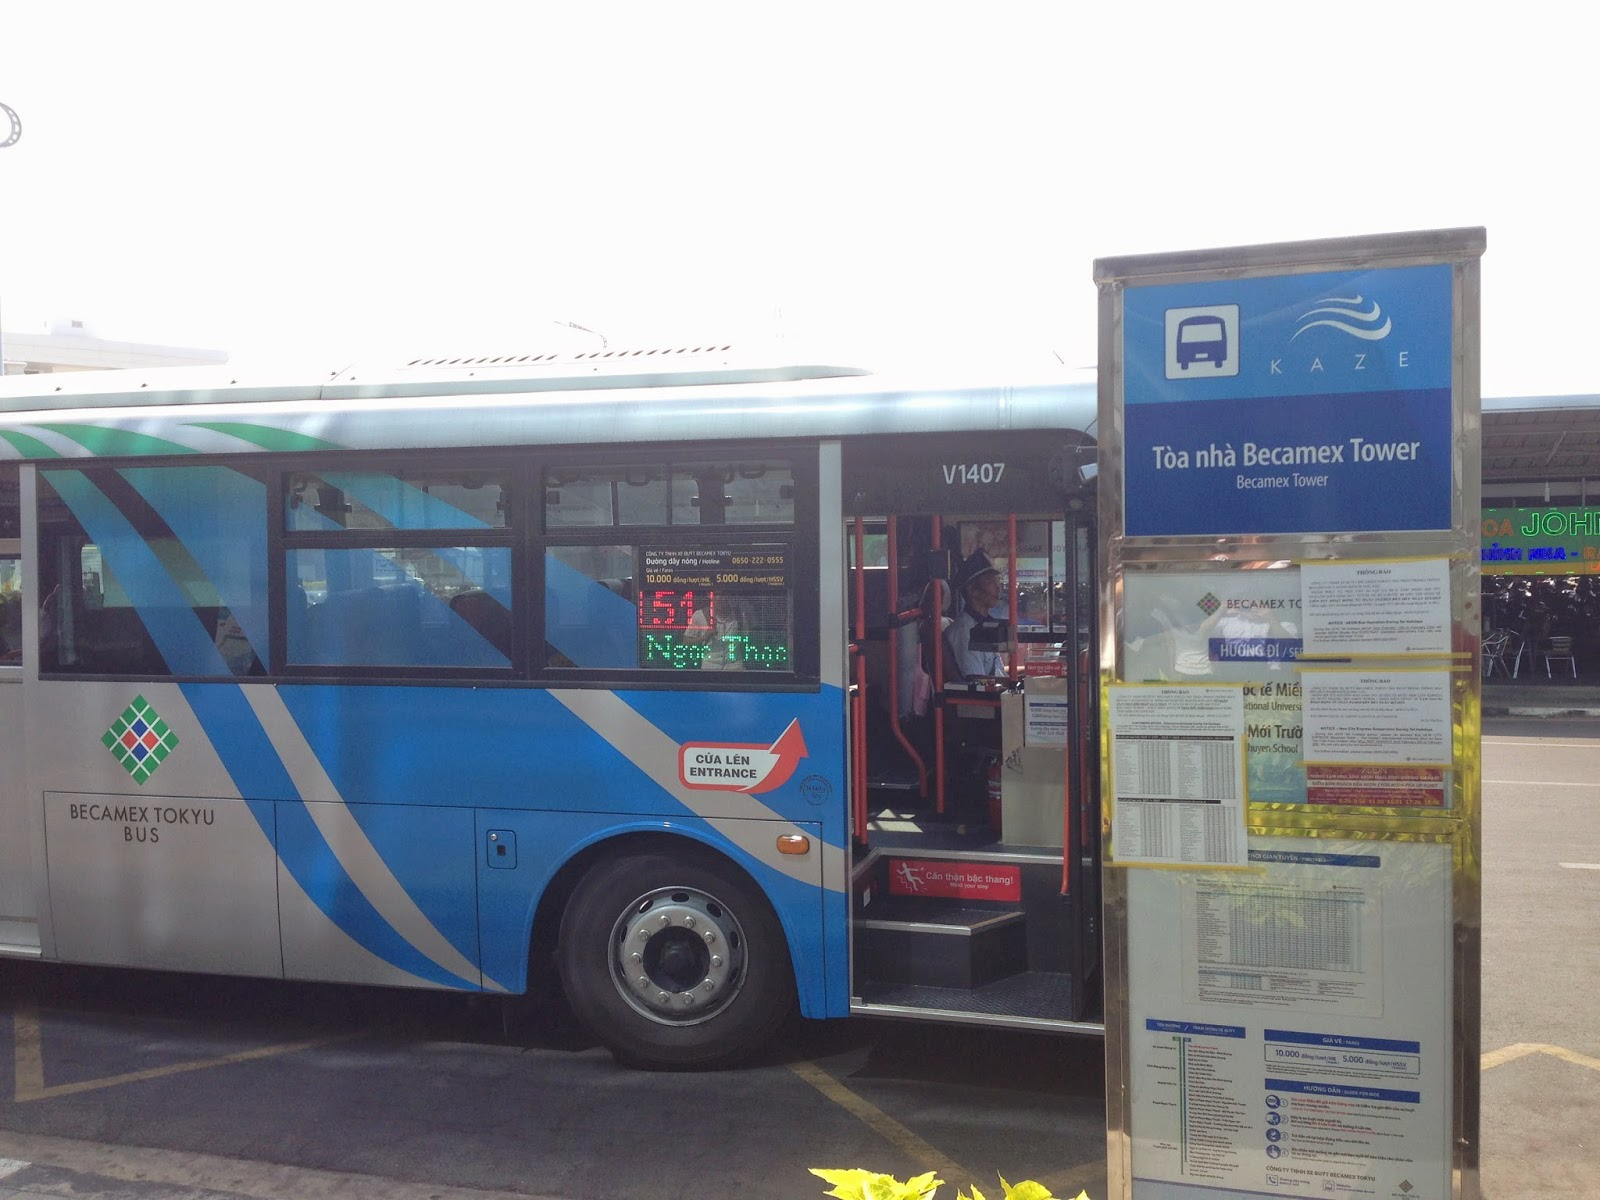 BECAMEX TOKYU BUS KAZE ベカメックス東急バス